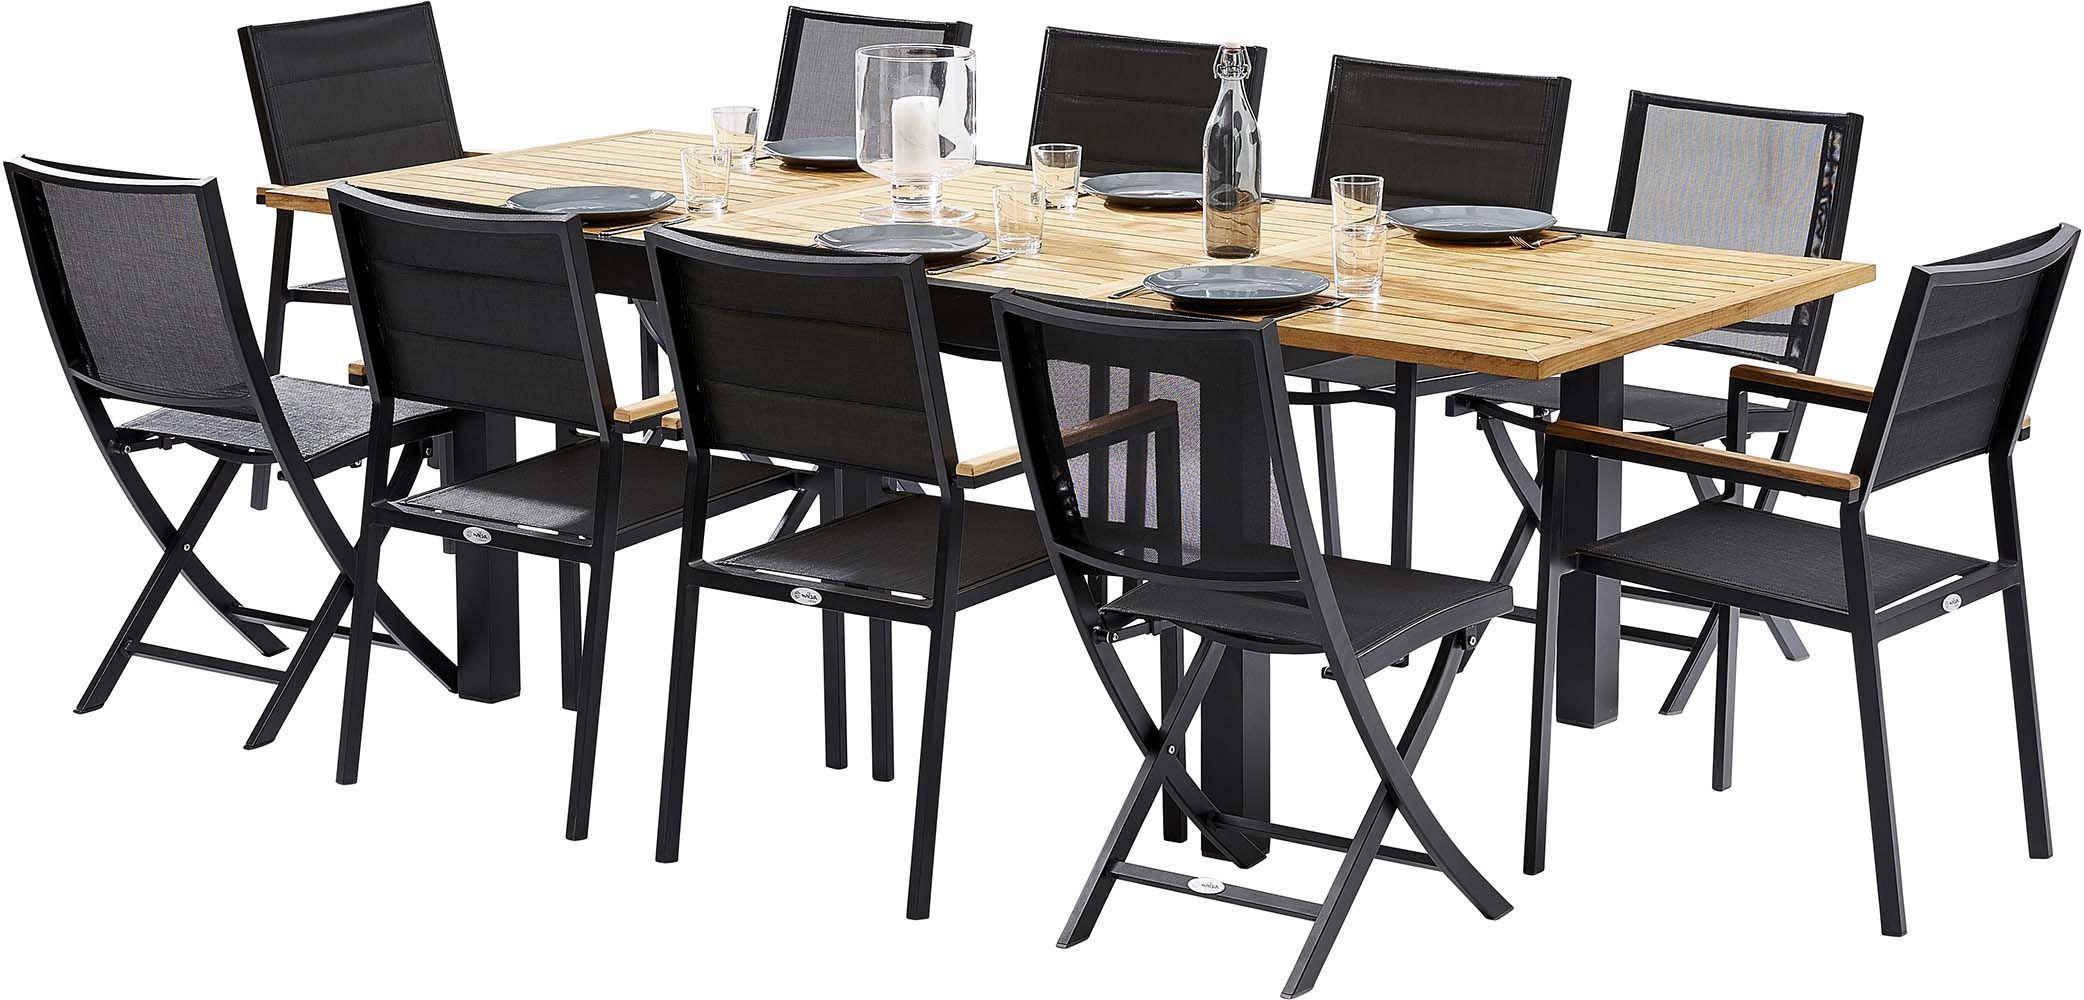 Table et chaises de jardin moderne bali - Table jardin moderne dijon ...